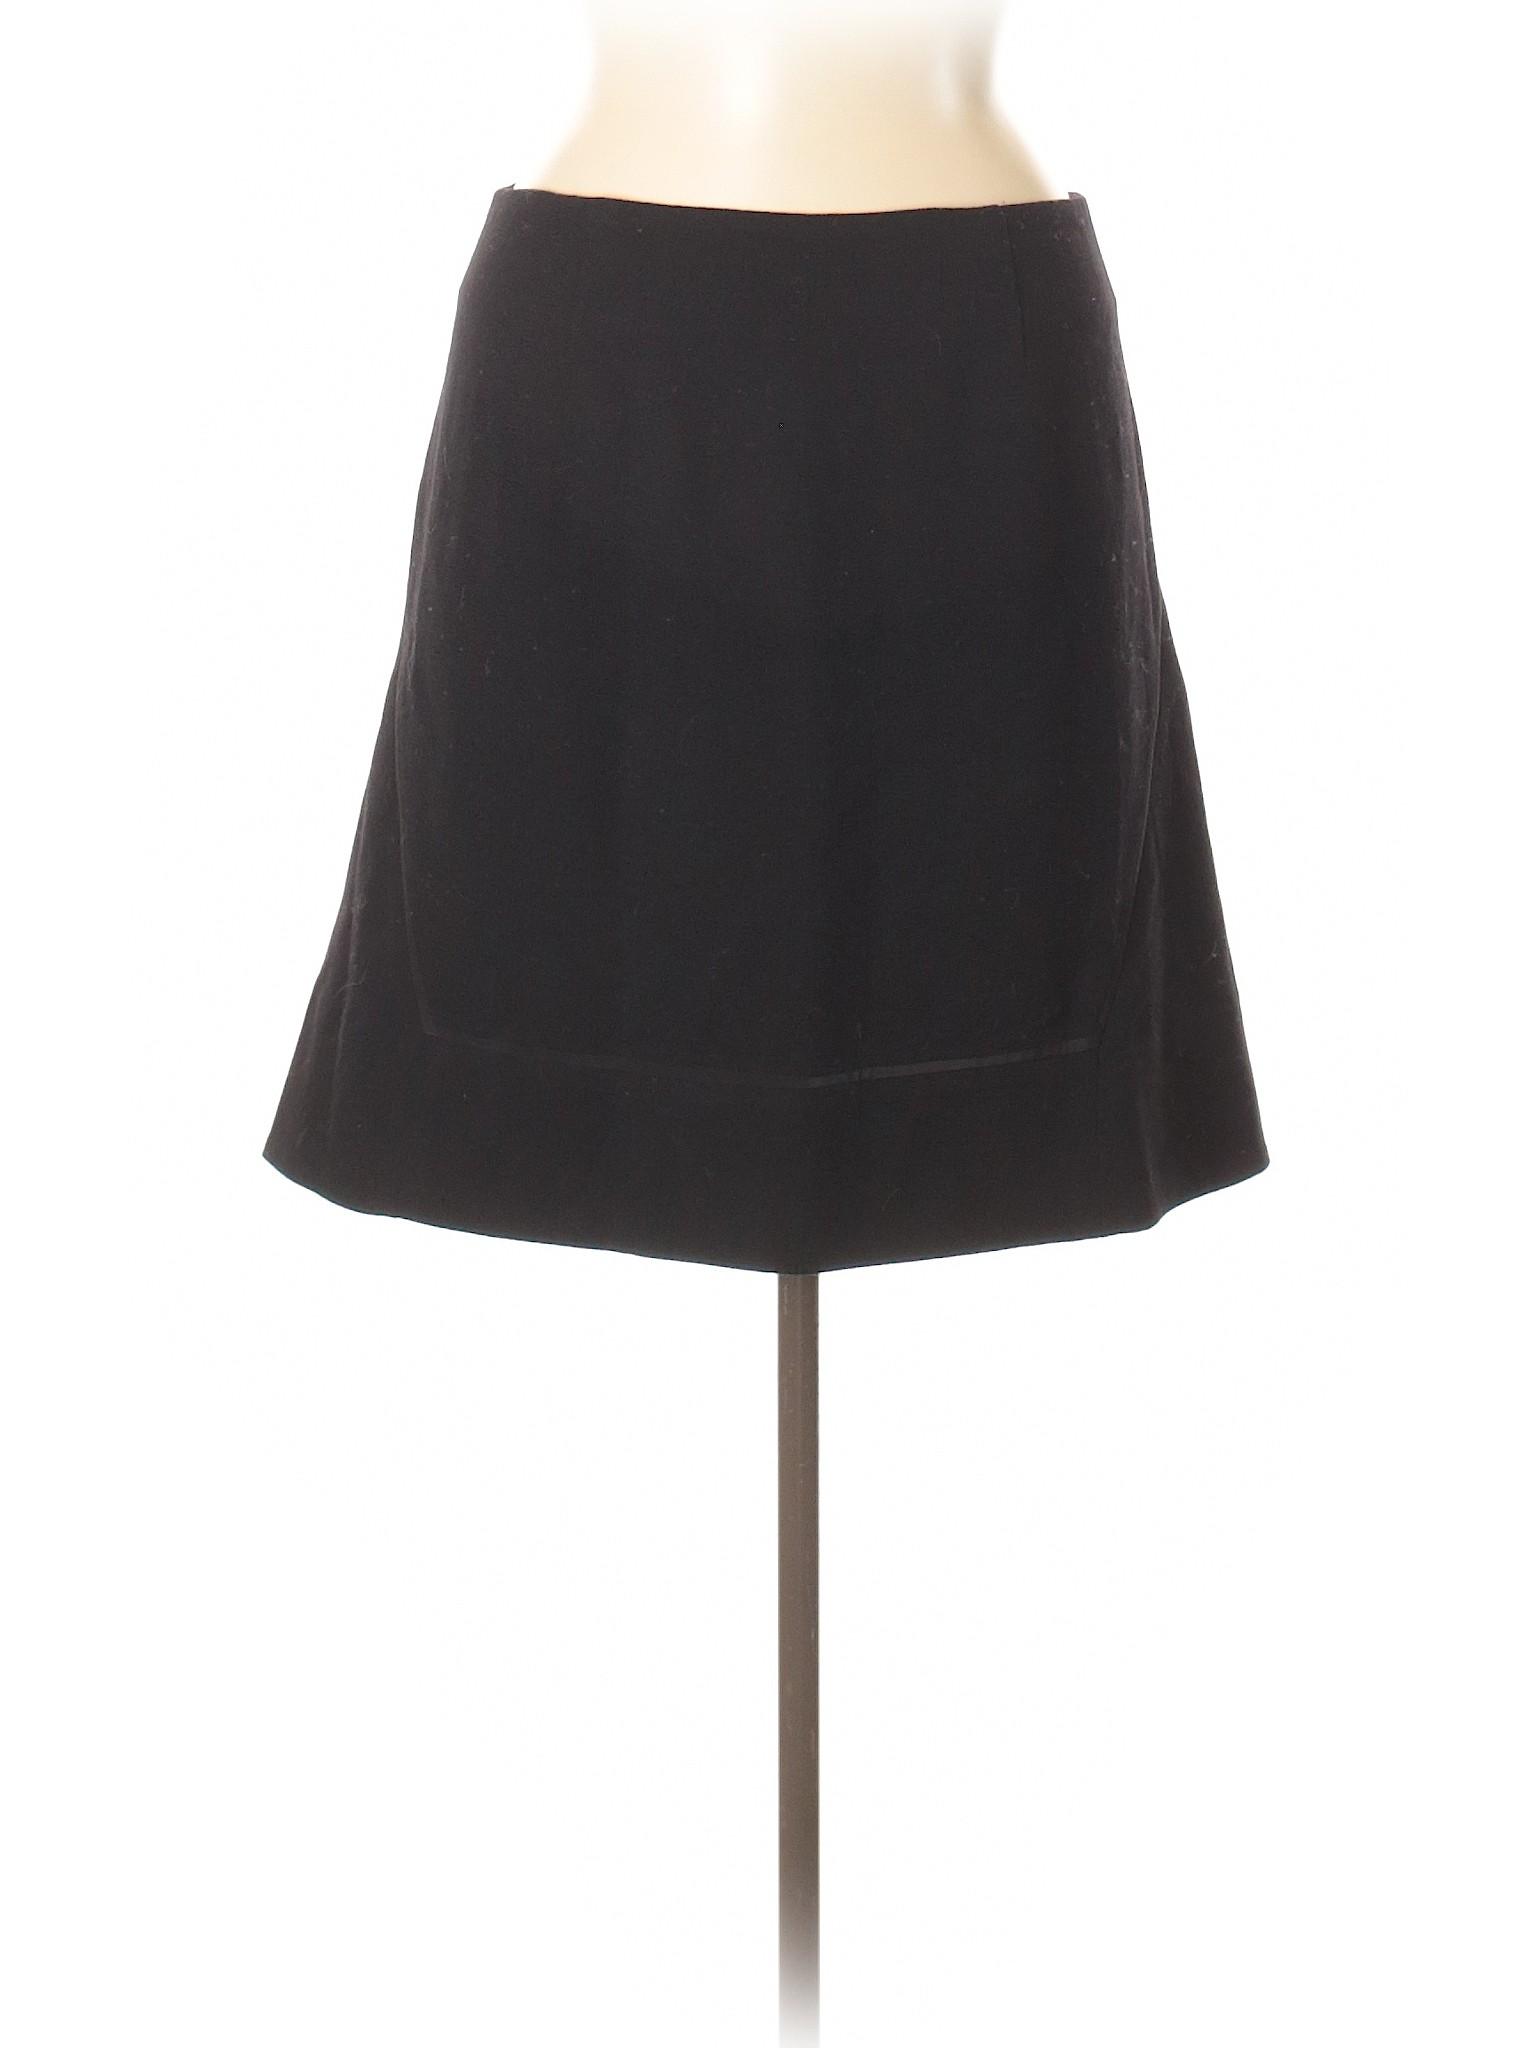 Burch Boutique leisure Wool Tory Skirt ggEFwqr